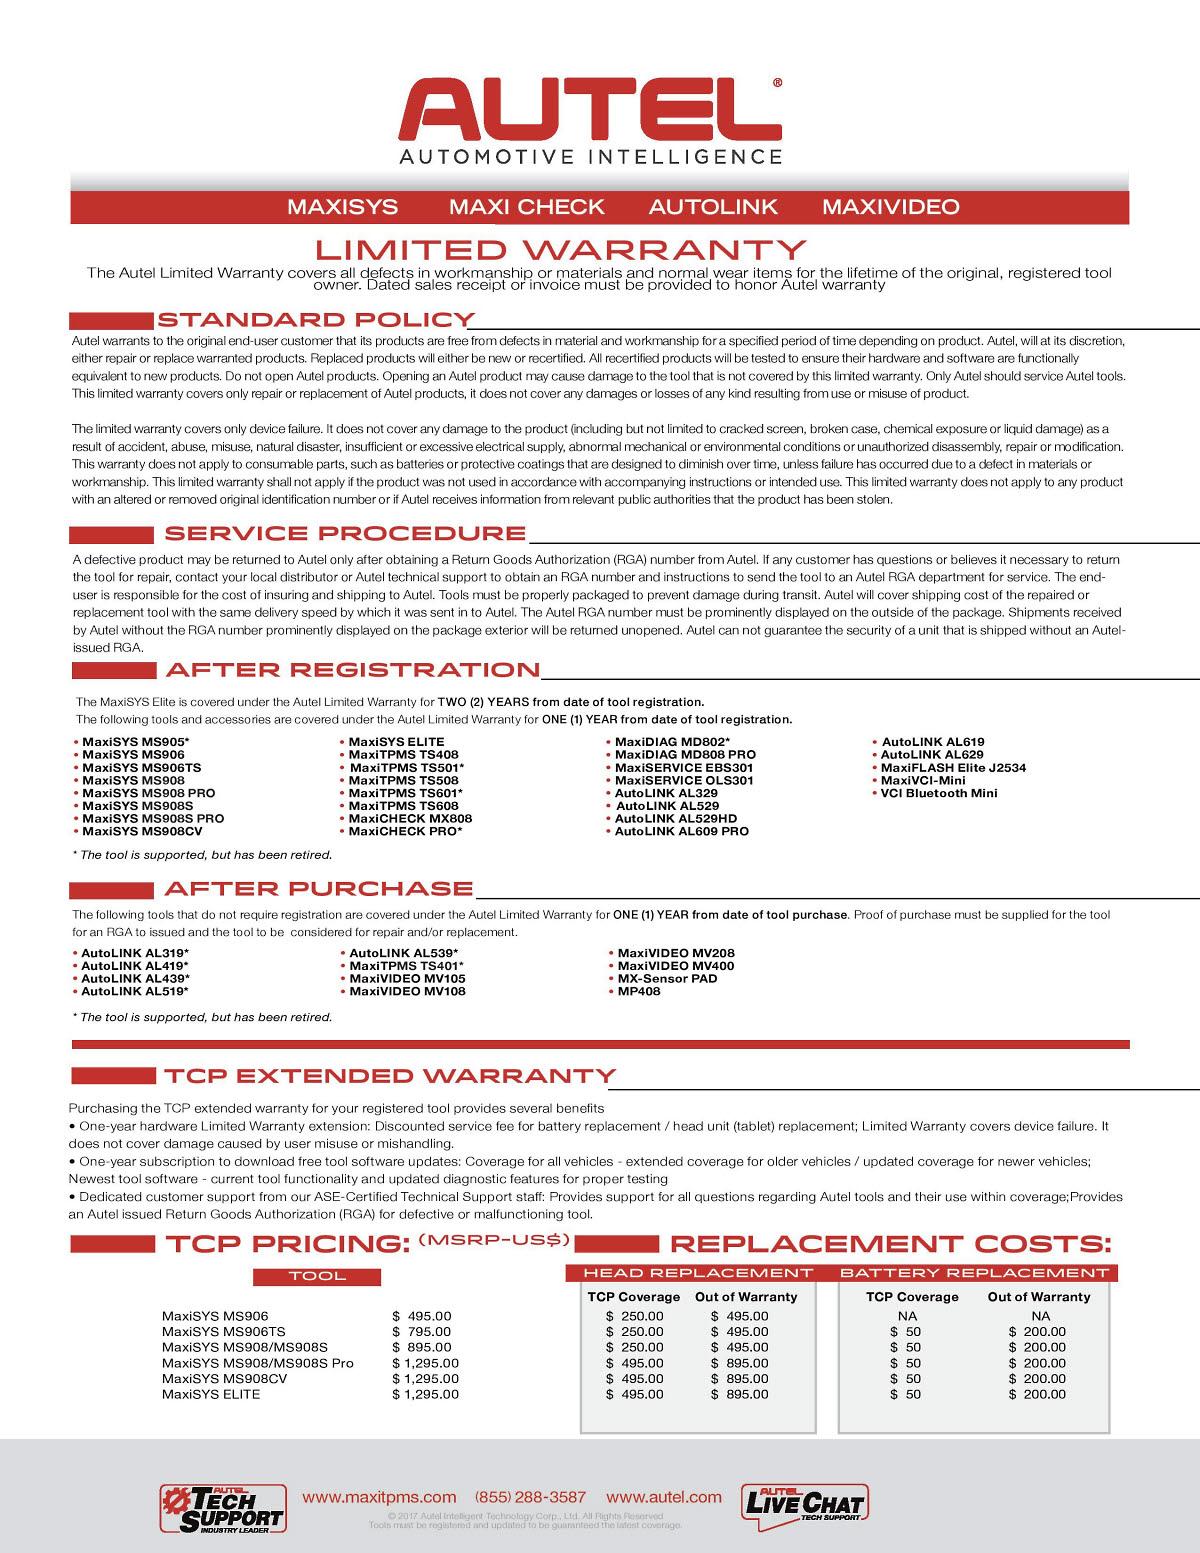 Autel MaxiDAS ms908 Elite update Total Care Package